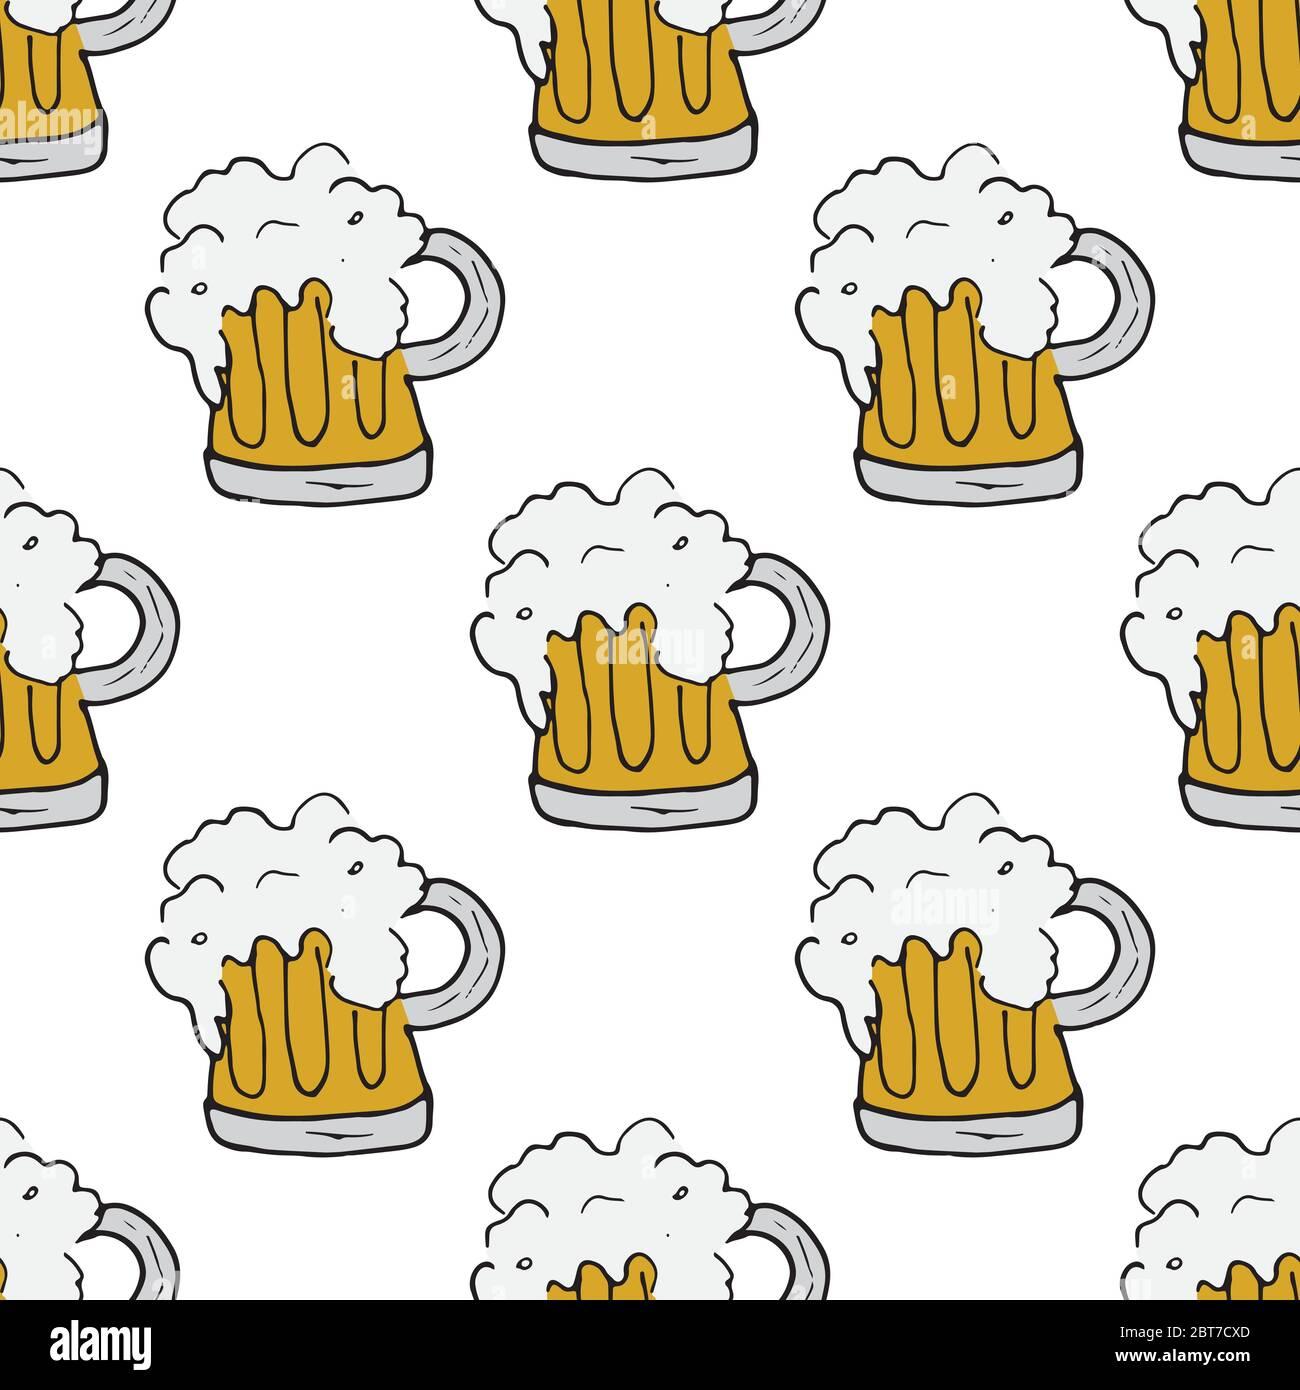 Beer Mug Seamless Pattern Hand Drawn Doodle Background Vector Illustration Stock Vector Image Art Alamy